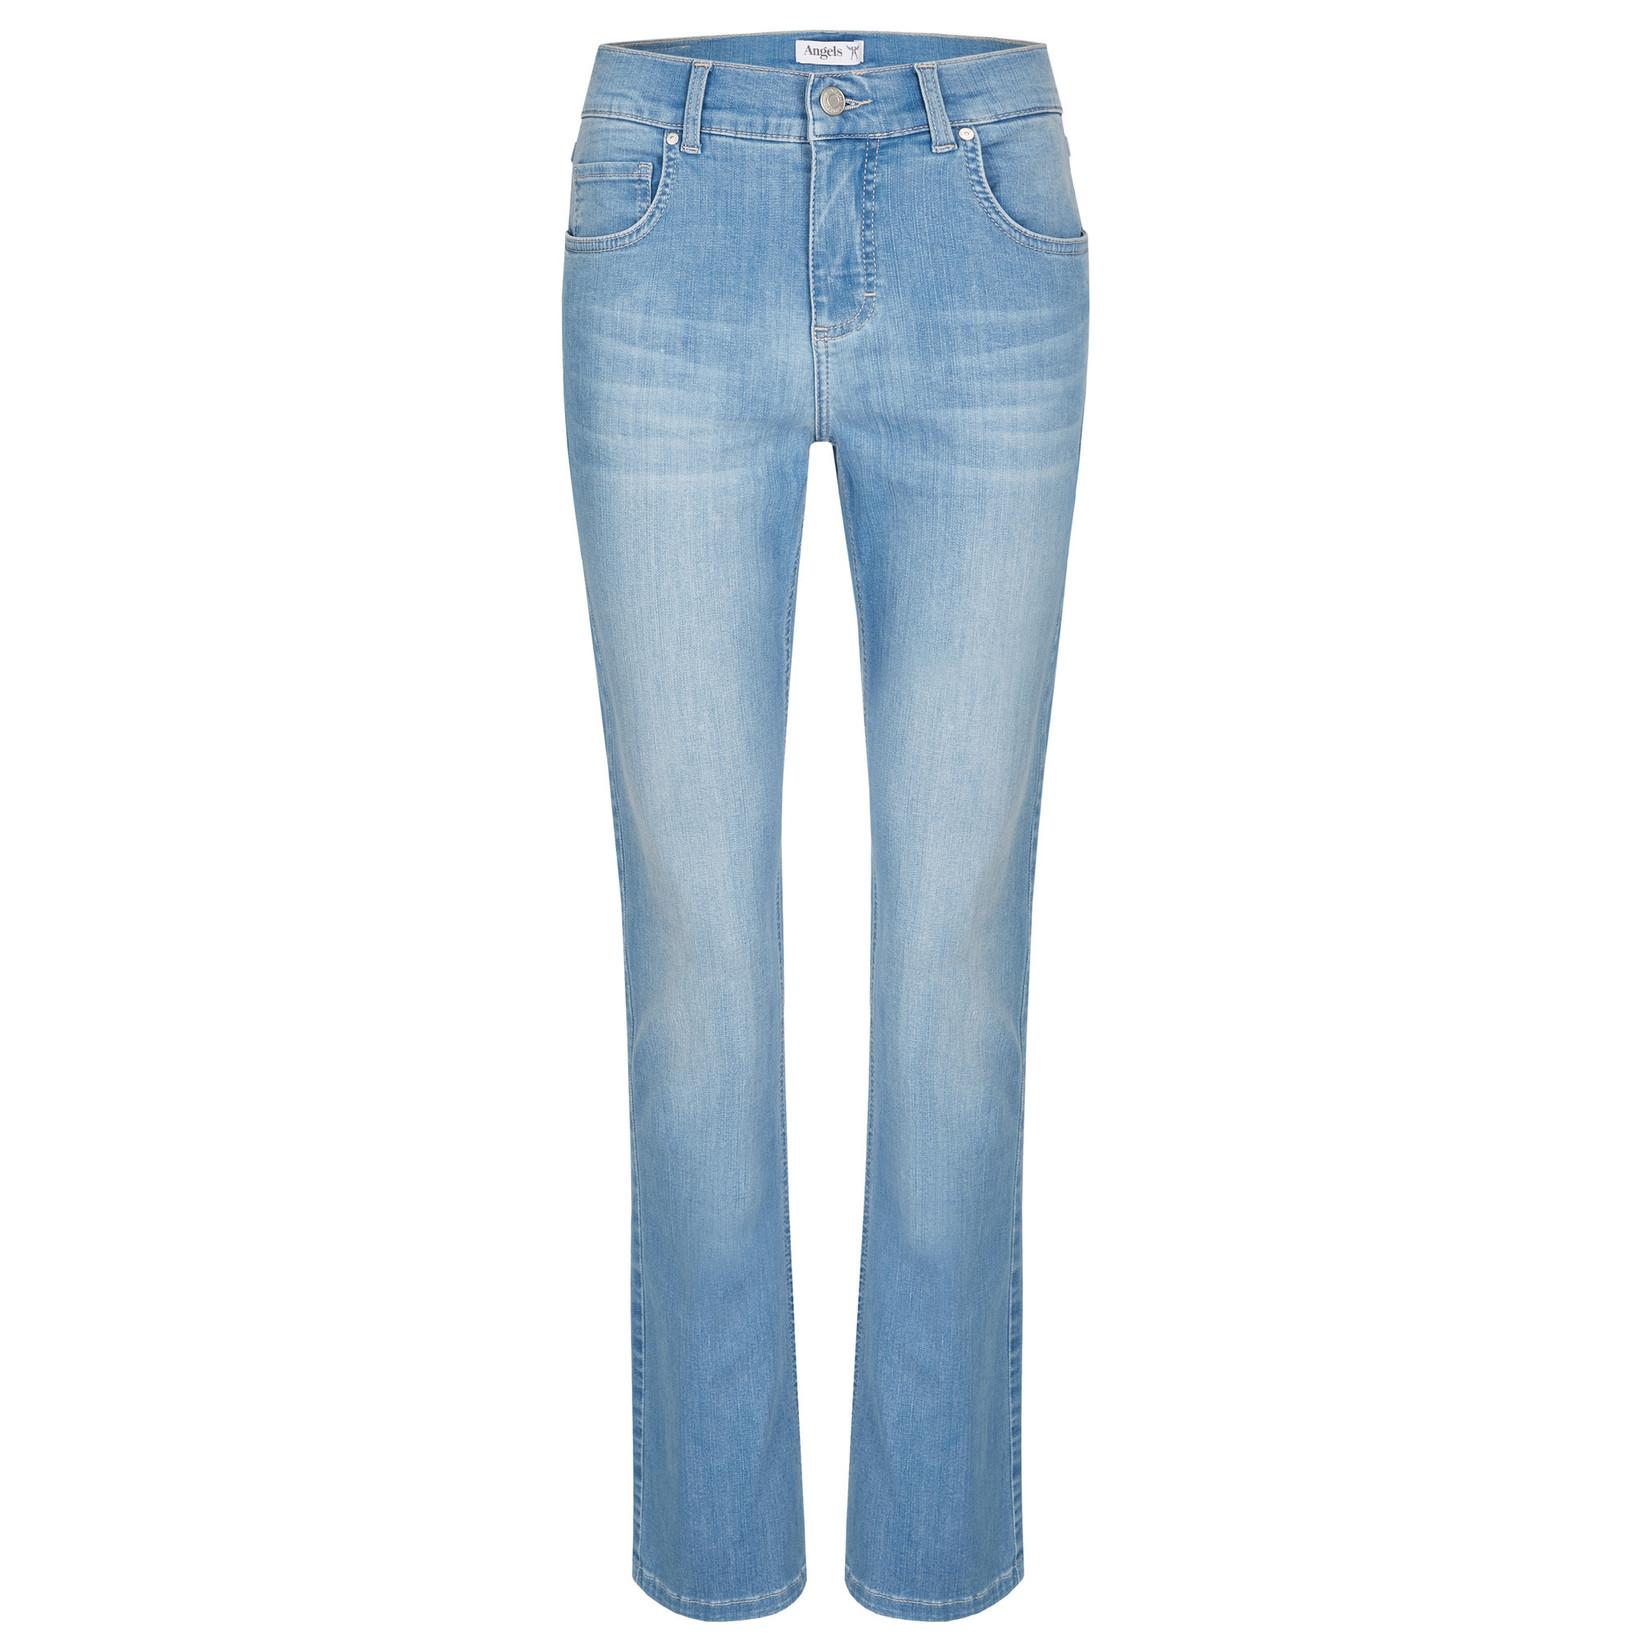 Angels Angels Leni Jeans Light Bleu Used 3338900-3458